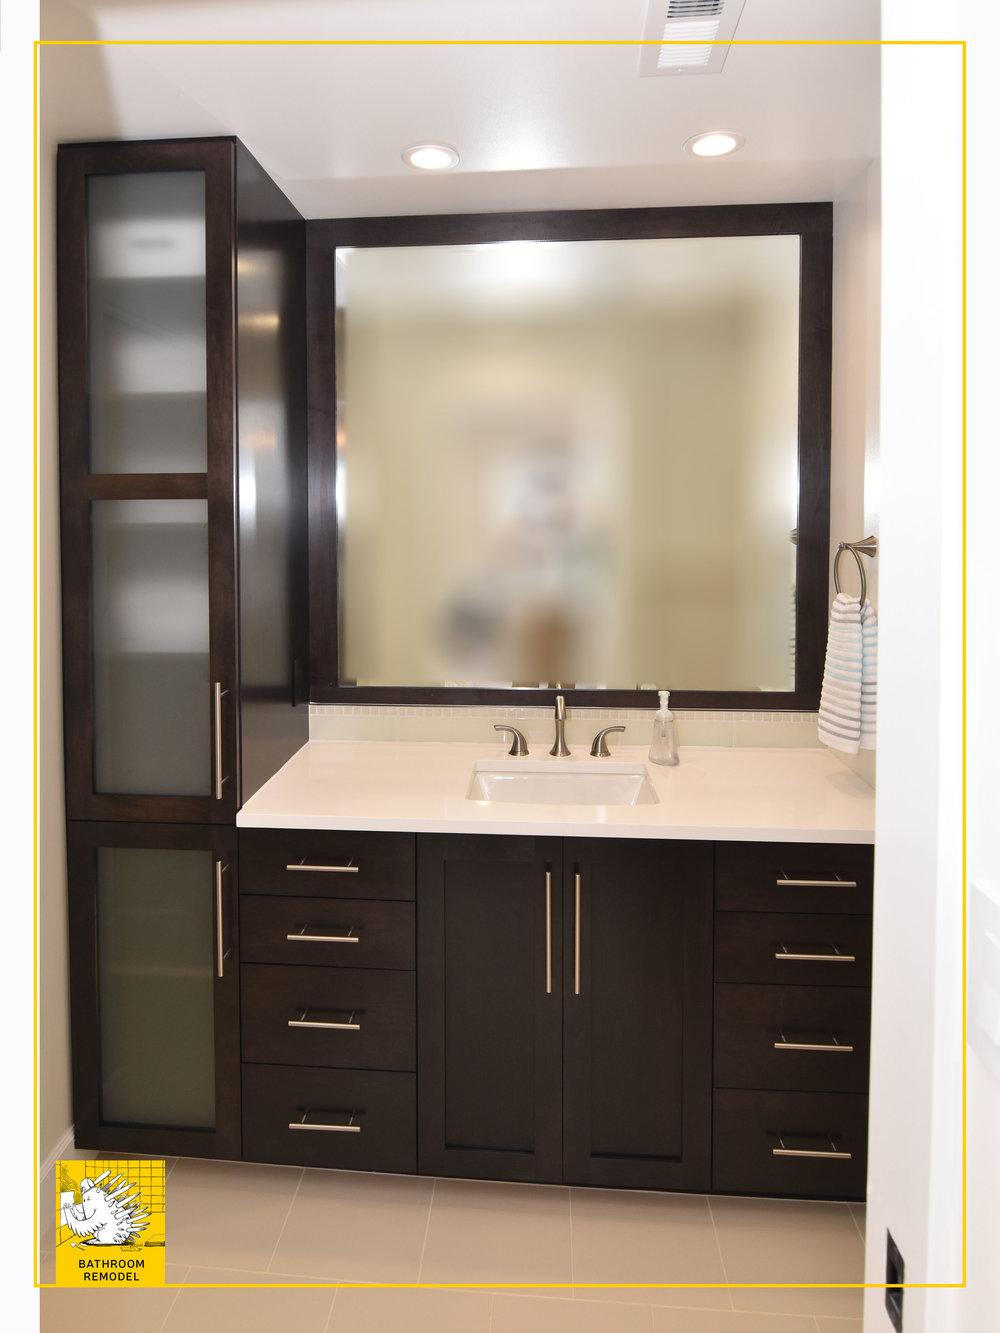 MT bathroom 6 after 6.jpg